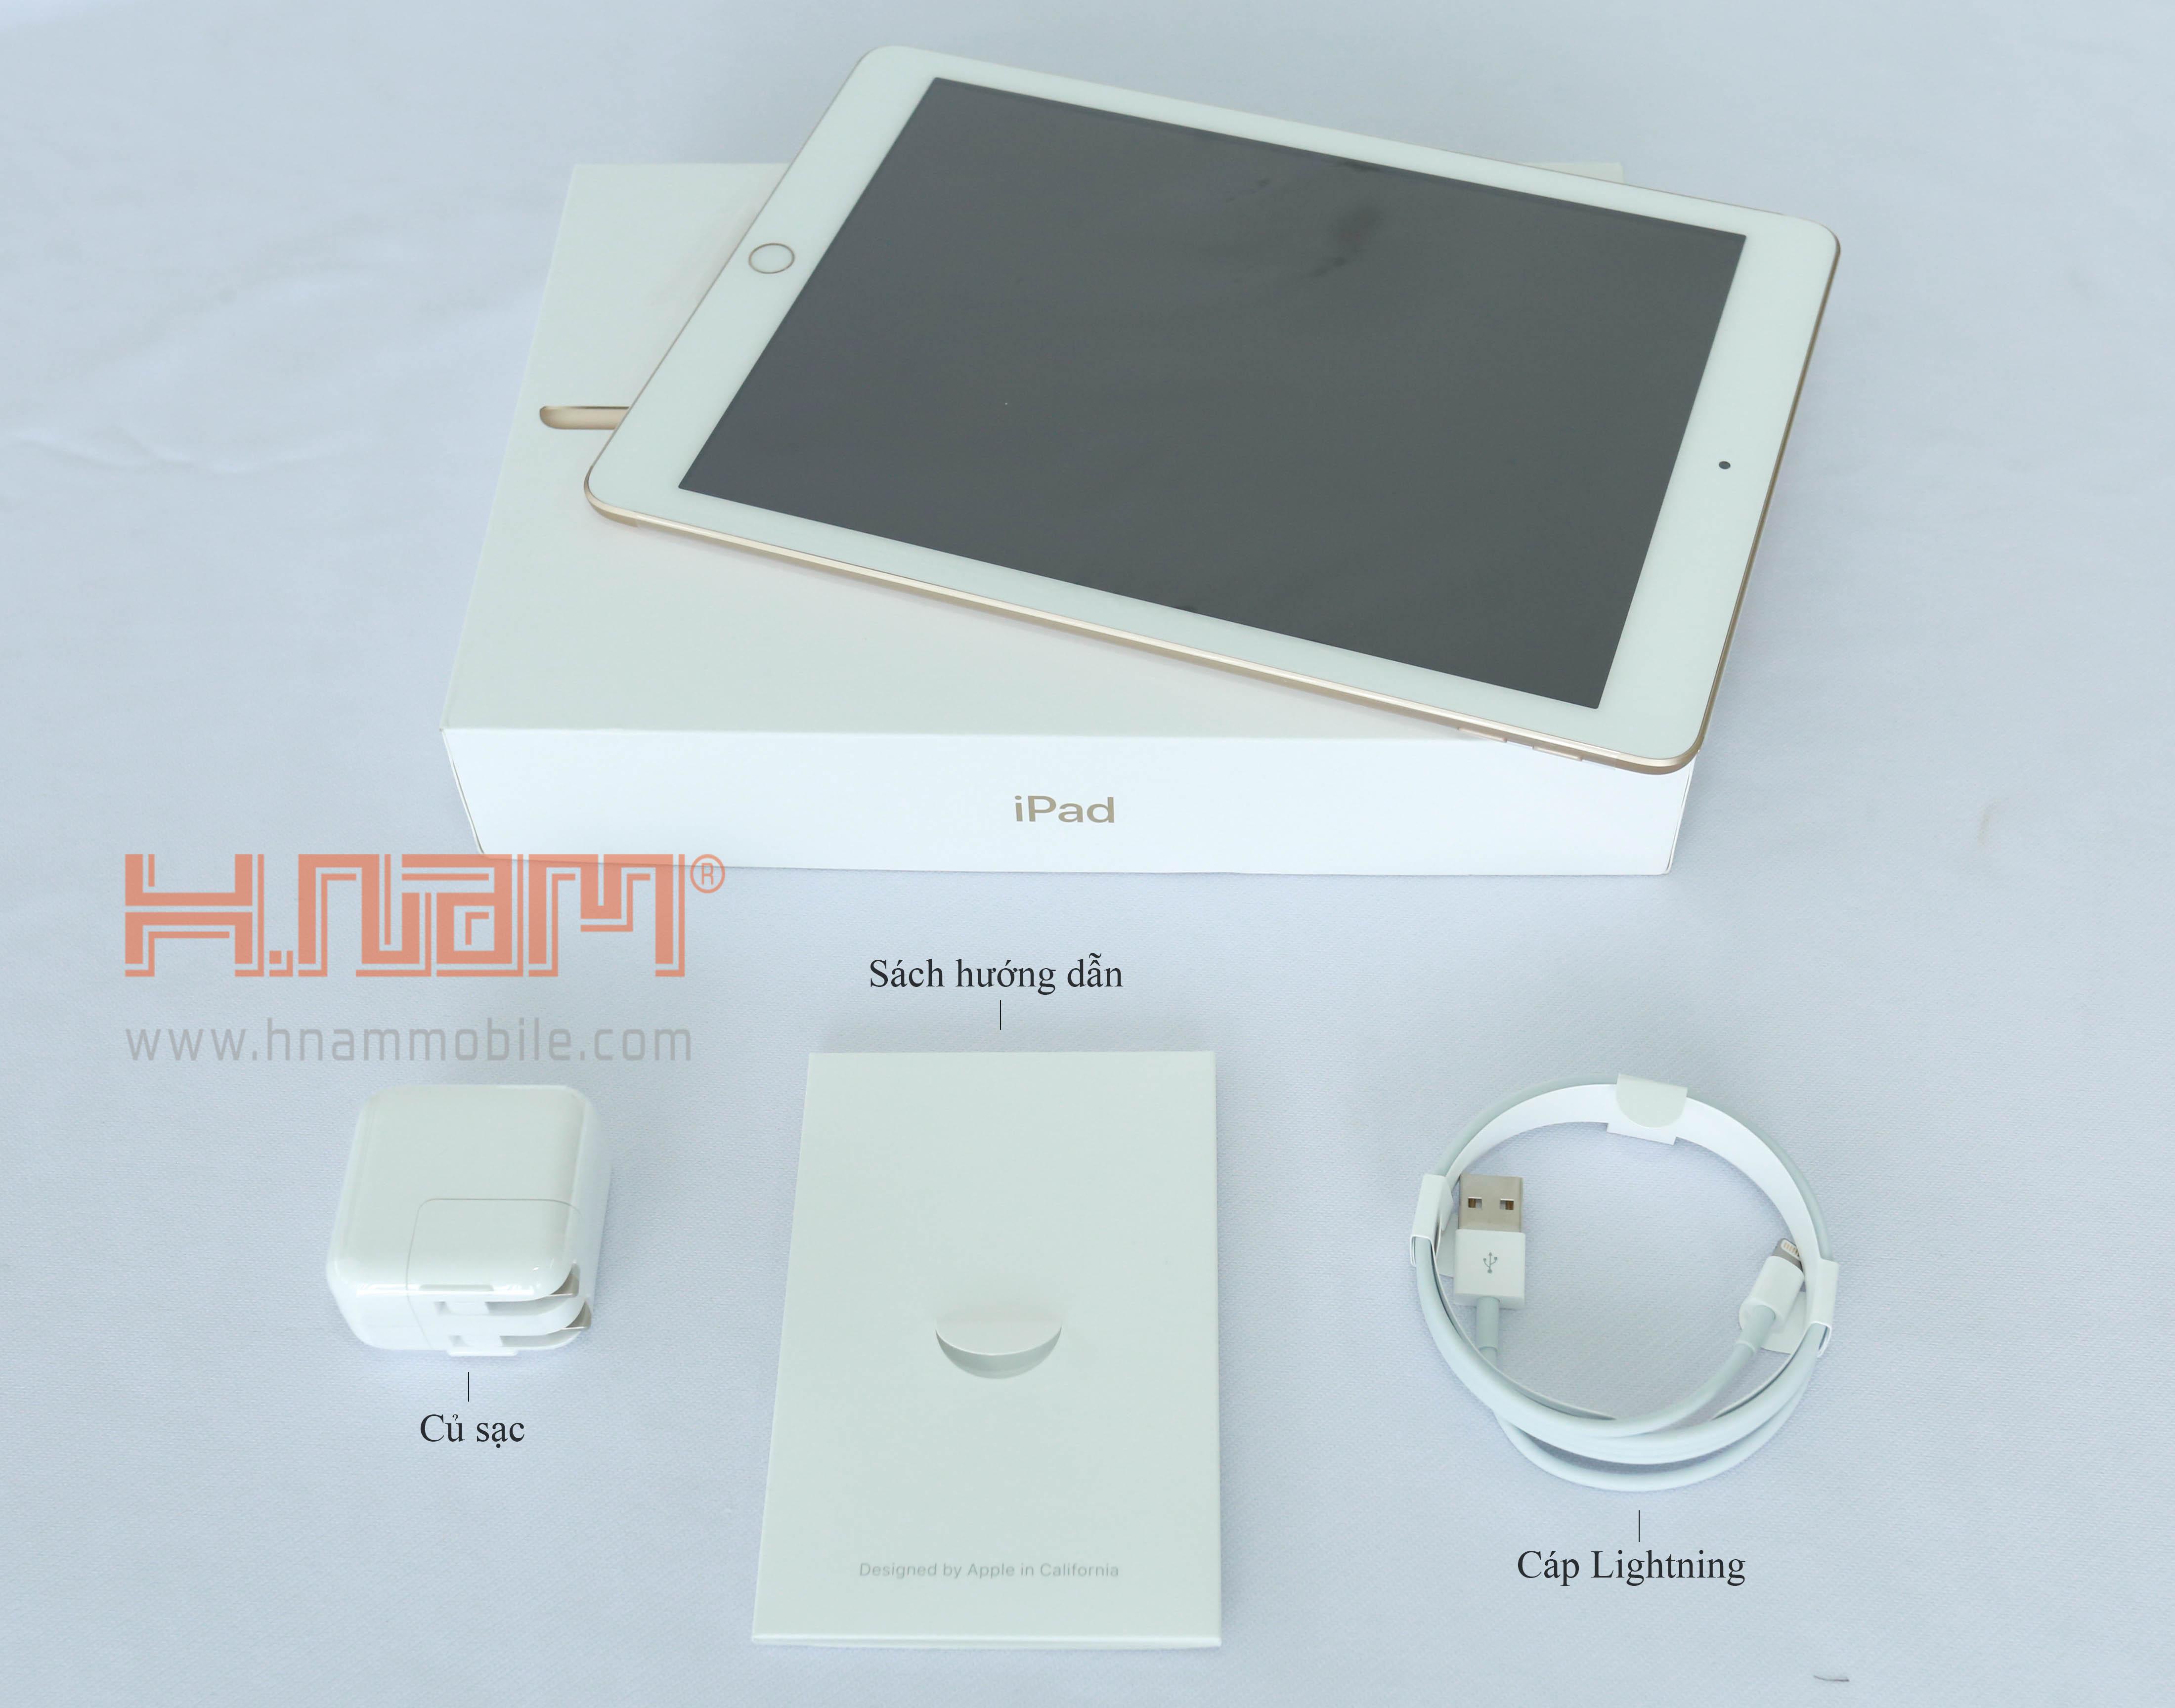 Apple iPad Gen 6 (2018) Wifi 32Gb hình sản phẩm 0